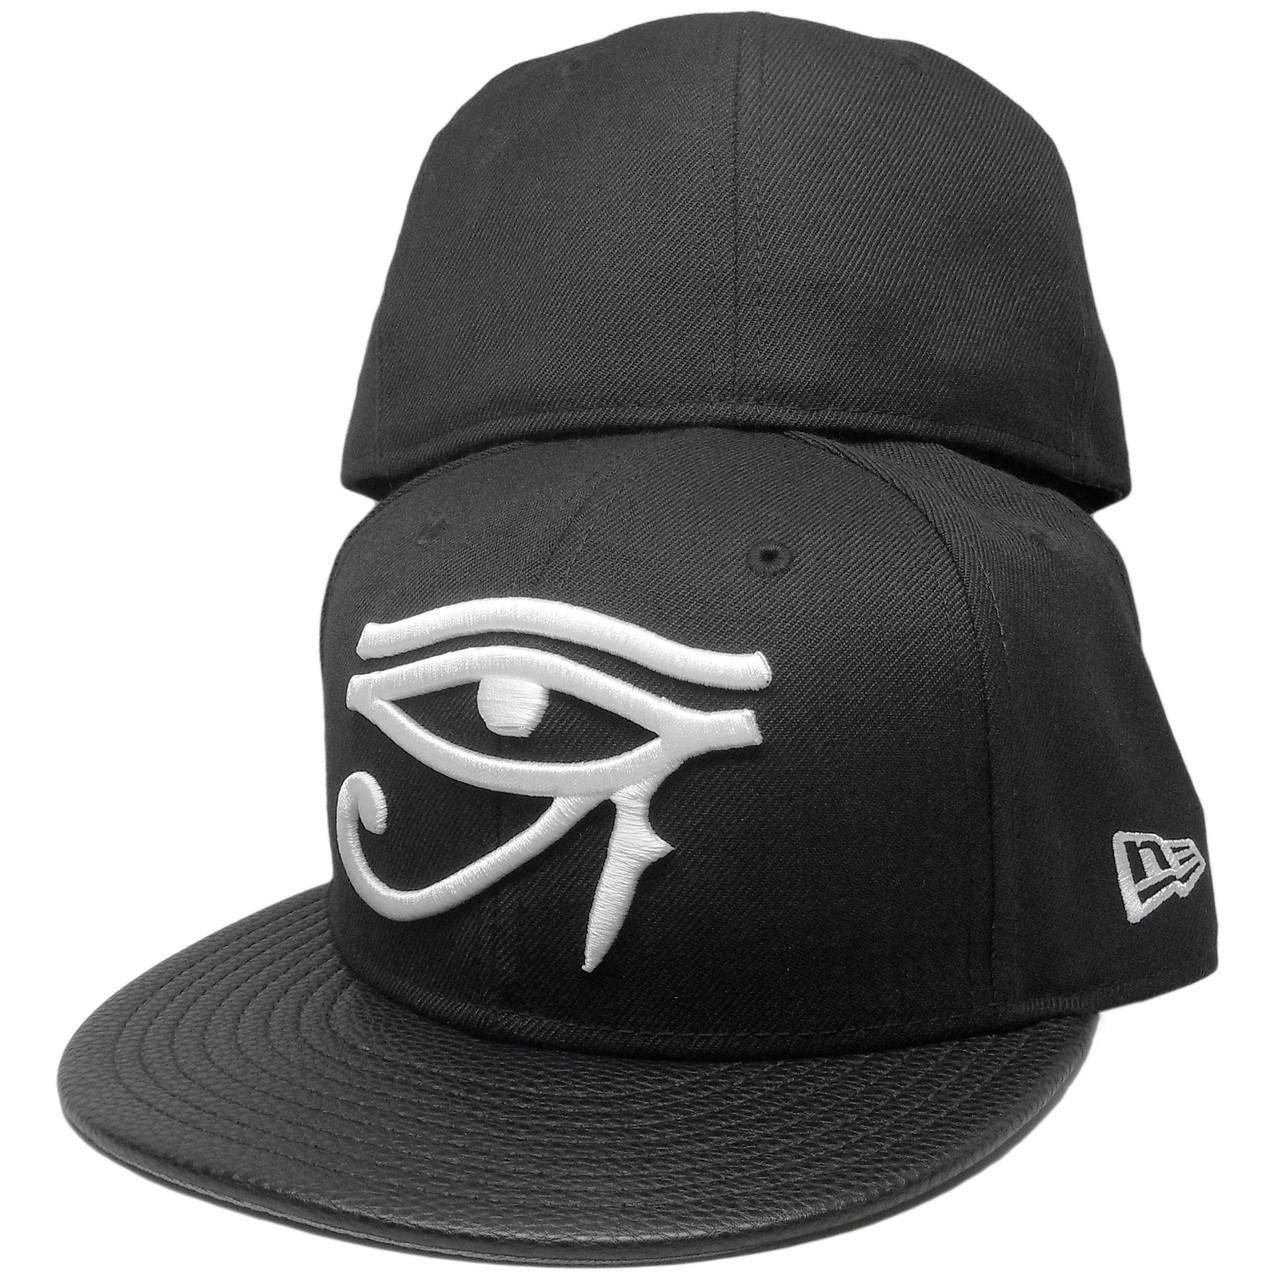 Eye Of Horus New Era Custom 59Fifty Fitted Hat - Black 29fac0136f78